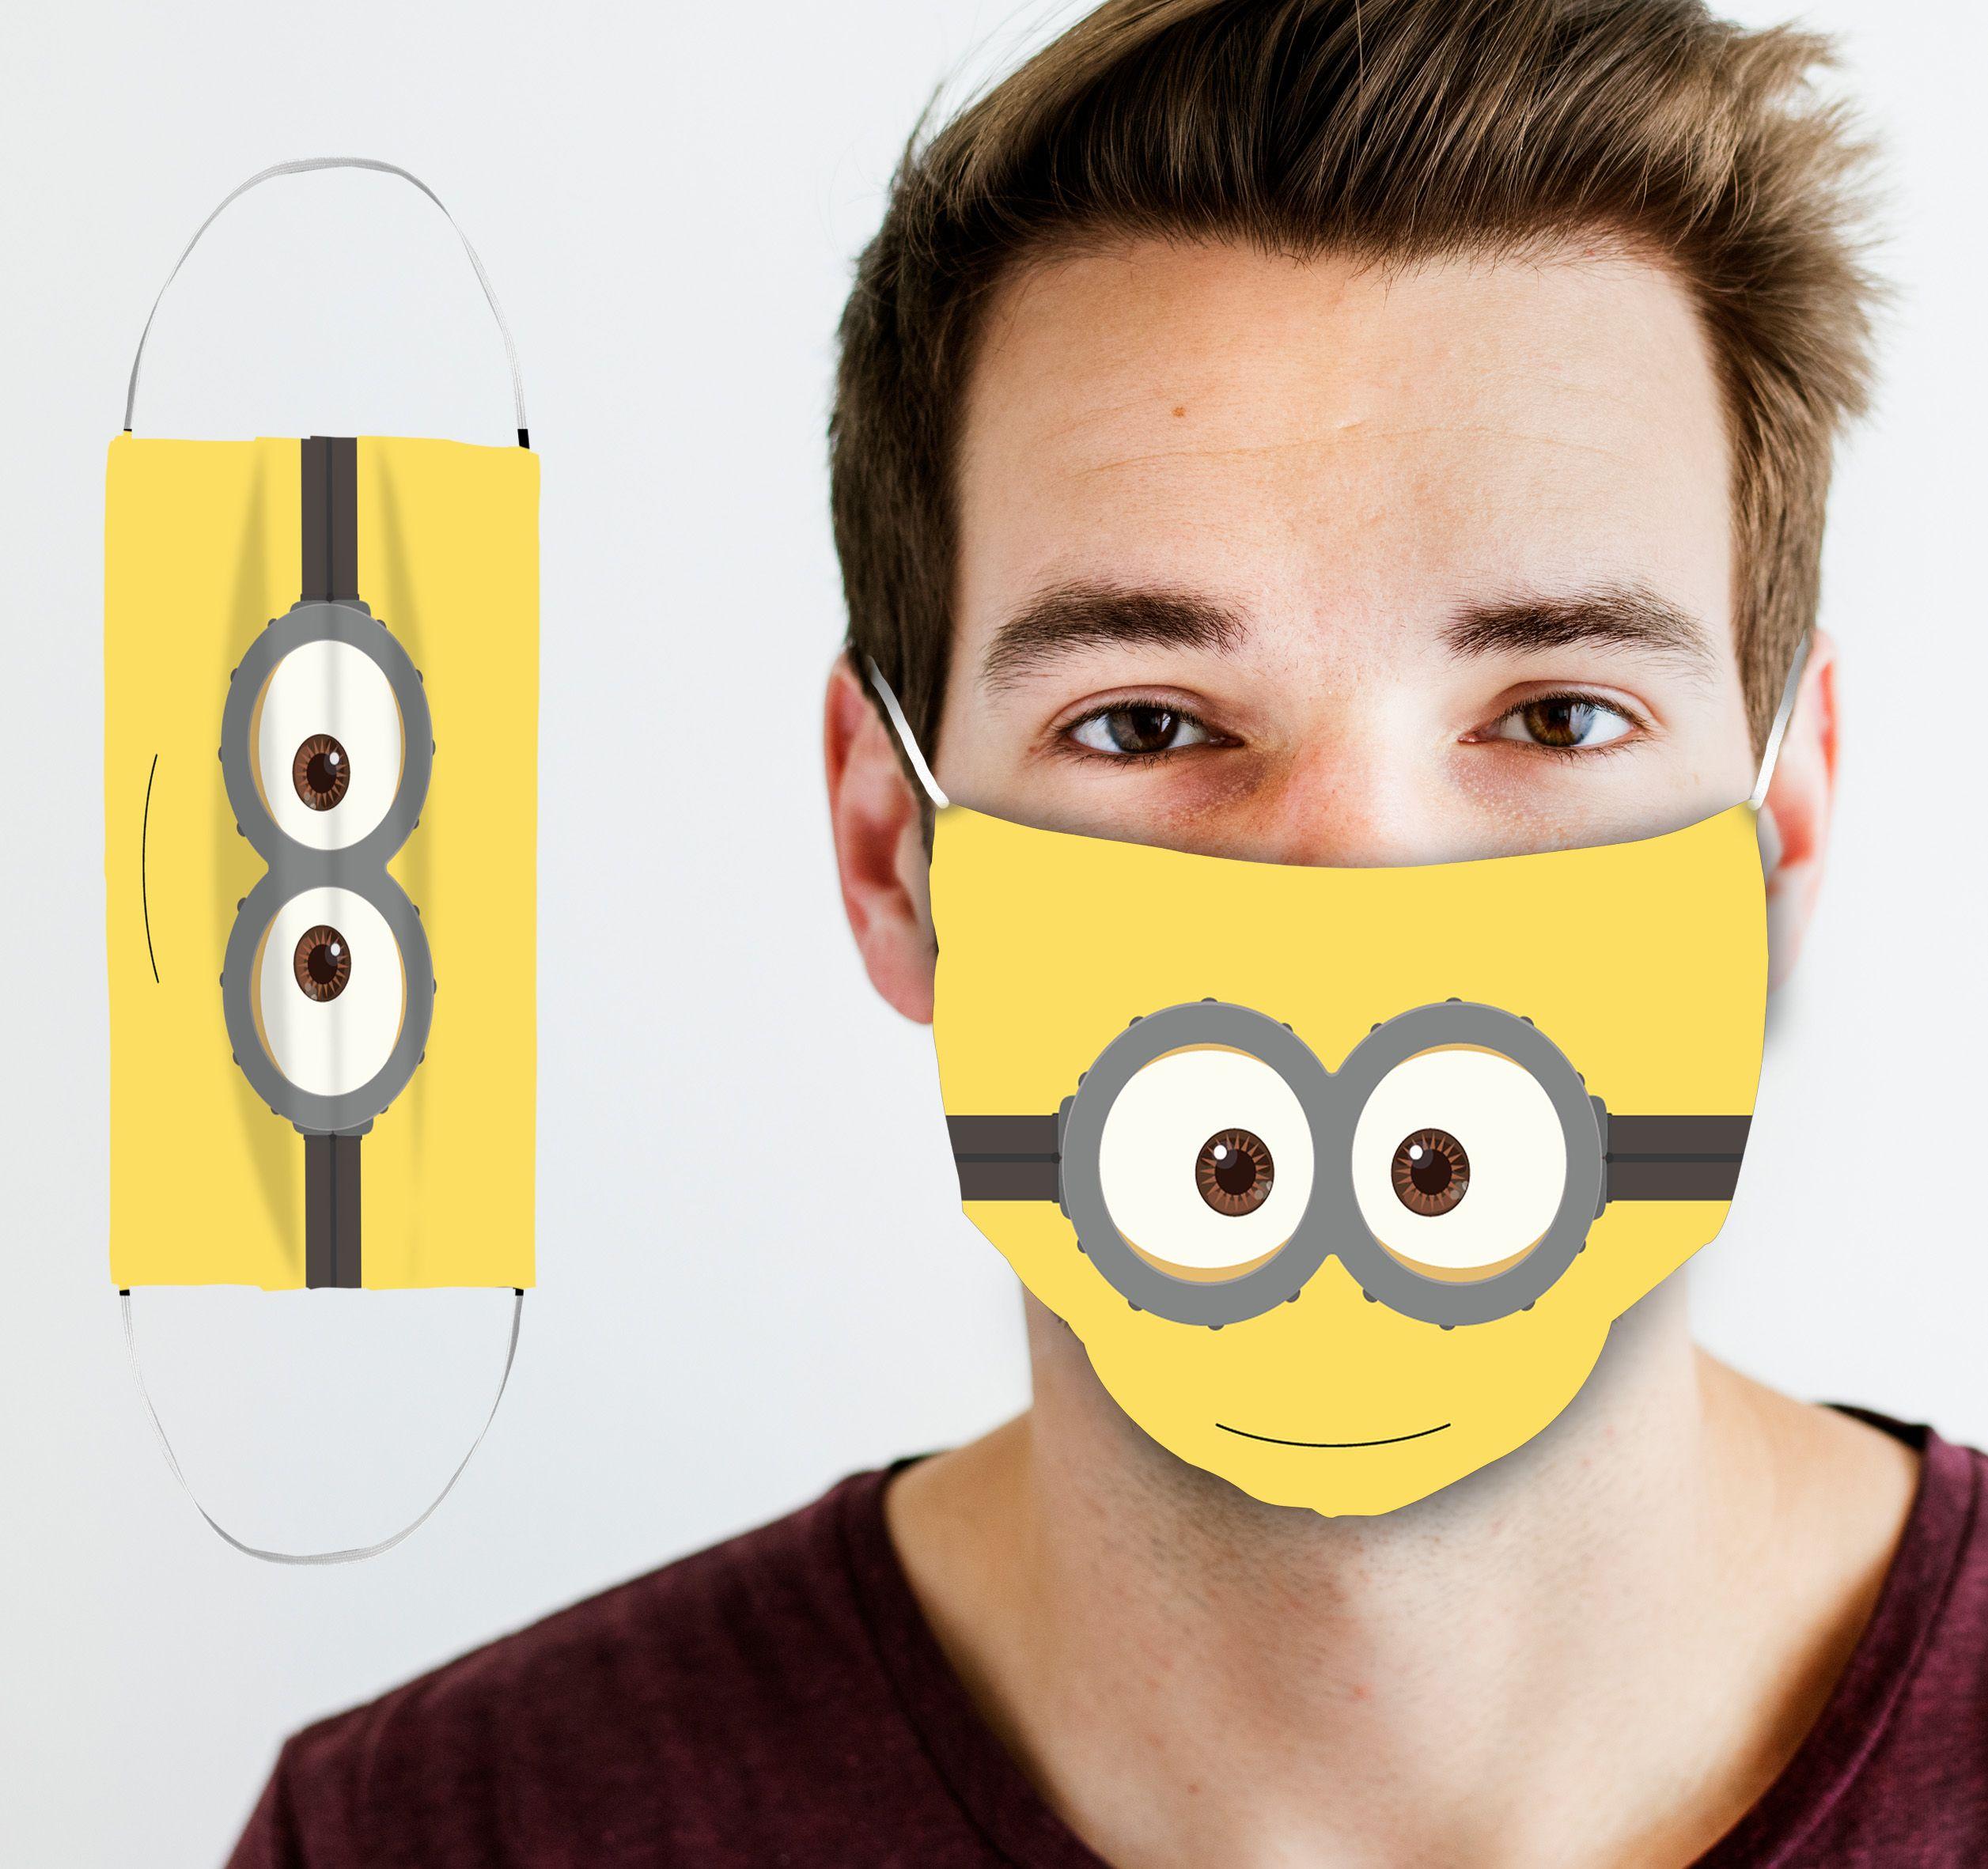 Minions Face Mask In 2020 Minion Face Minion Mask Minions